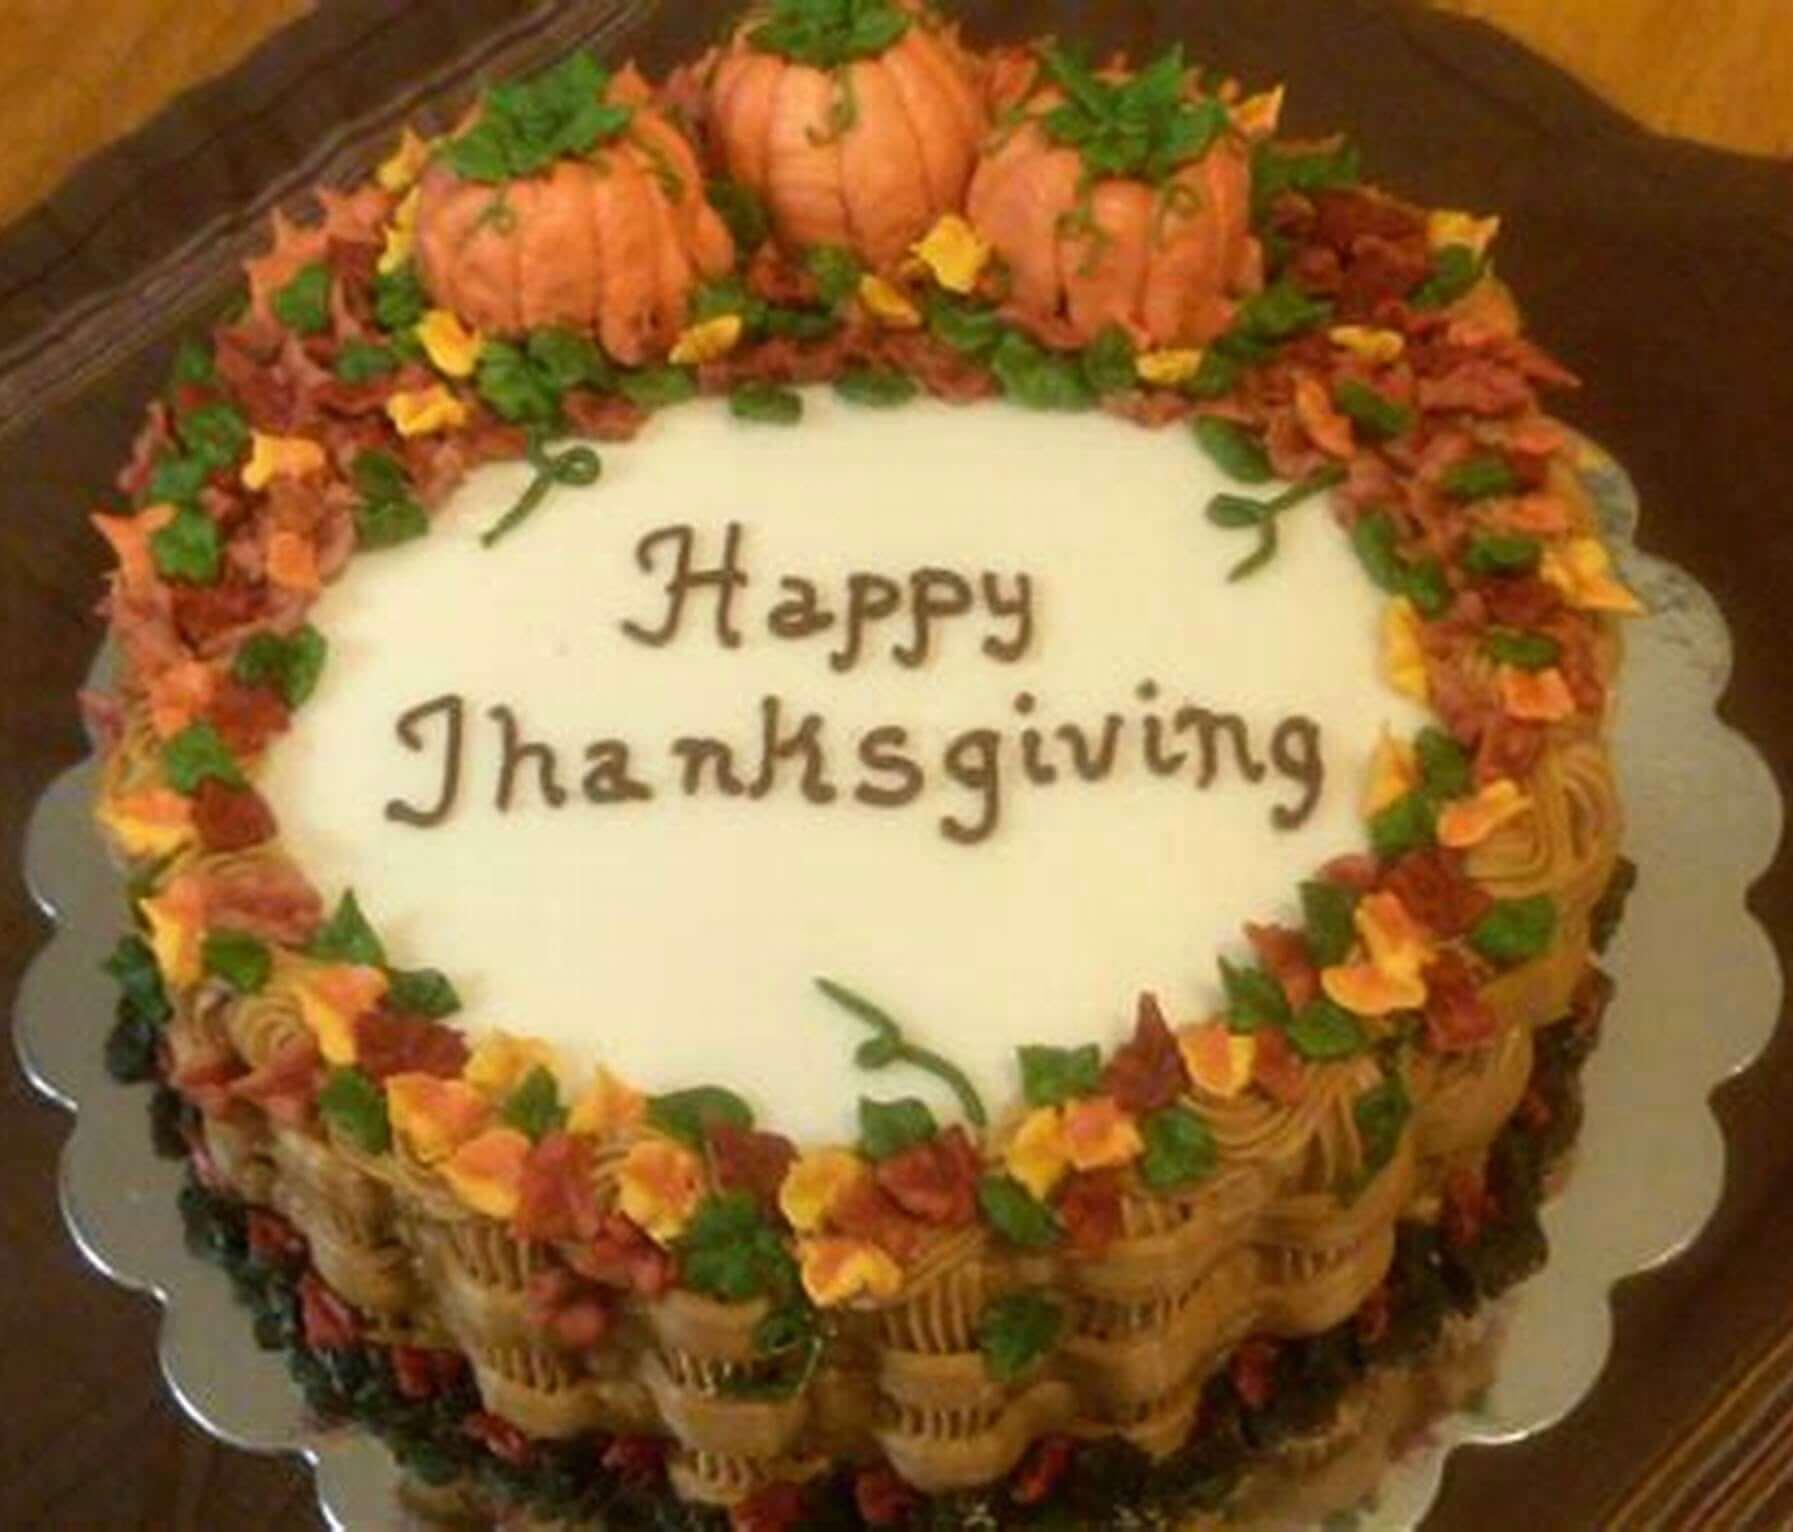 Thanksgiving Cake Images